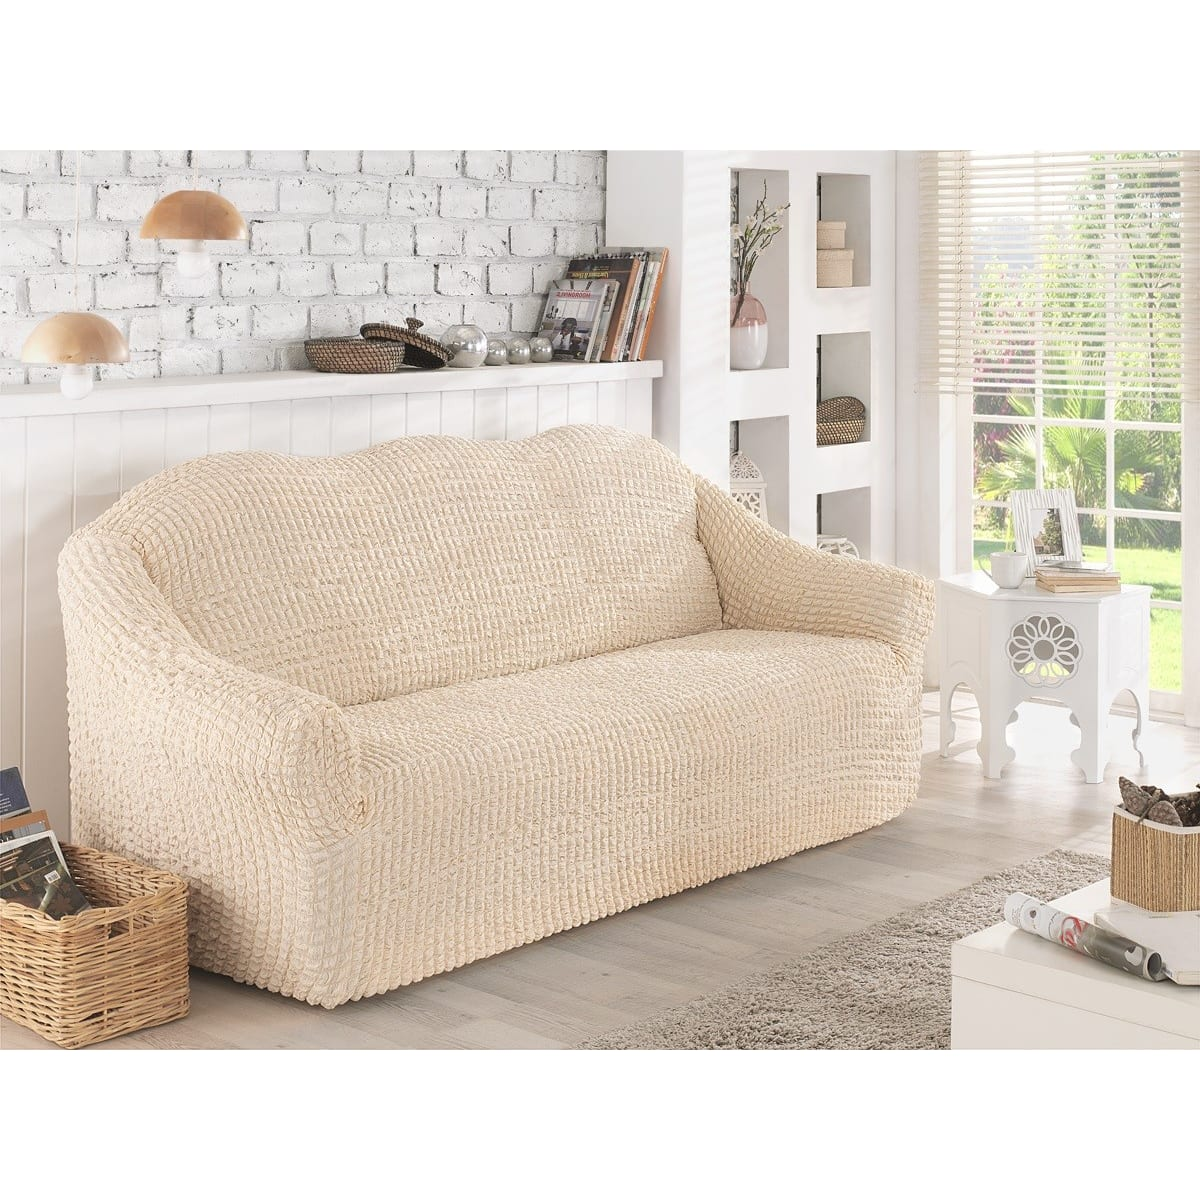 Чехол для двухместного дивана KARNA 2651/CHAR006, 160 см